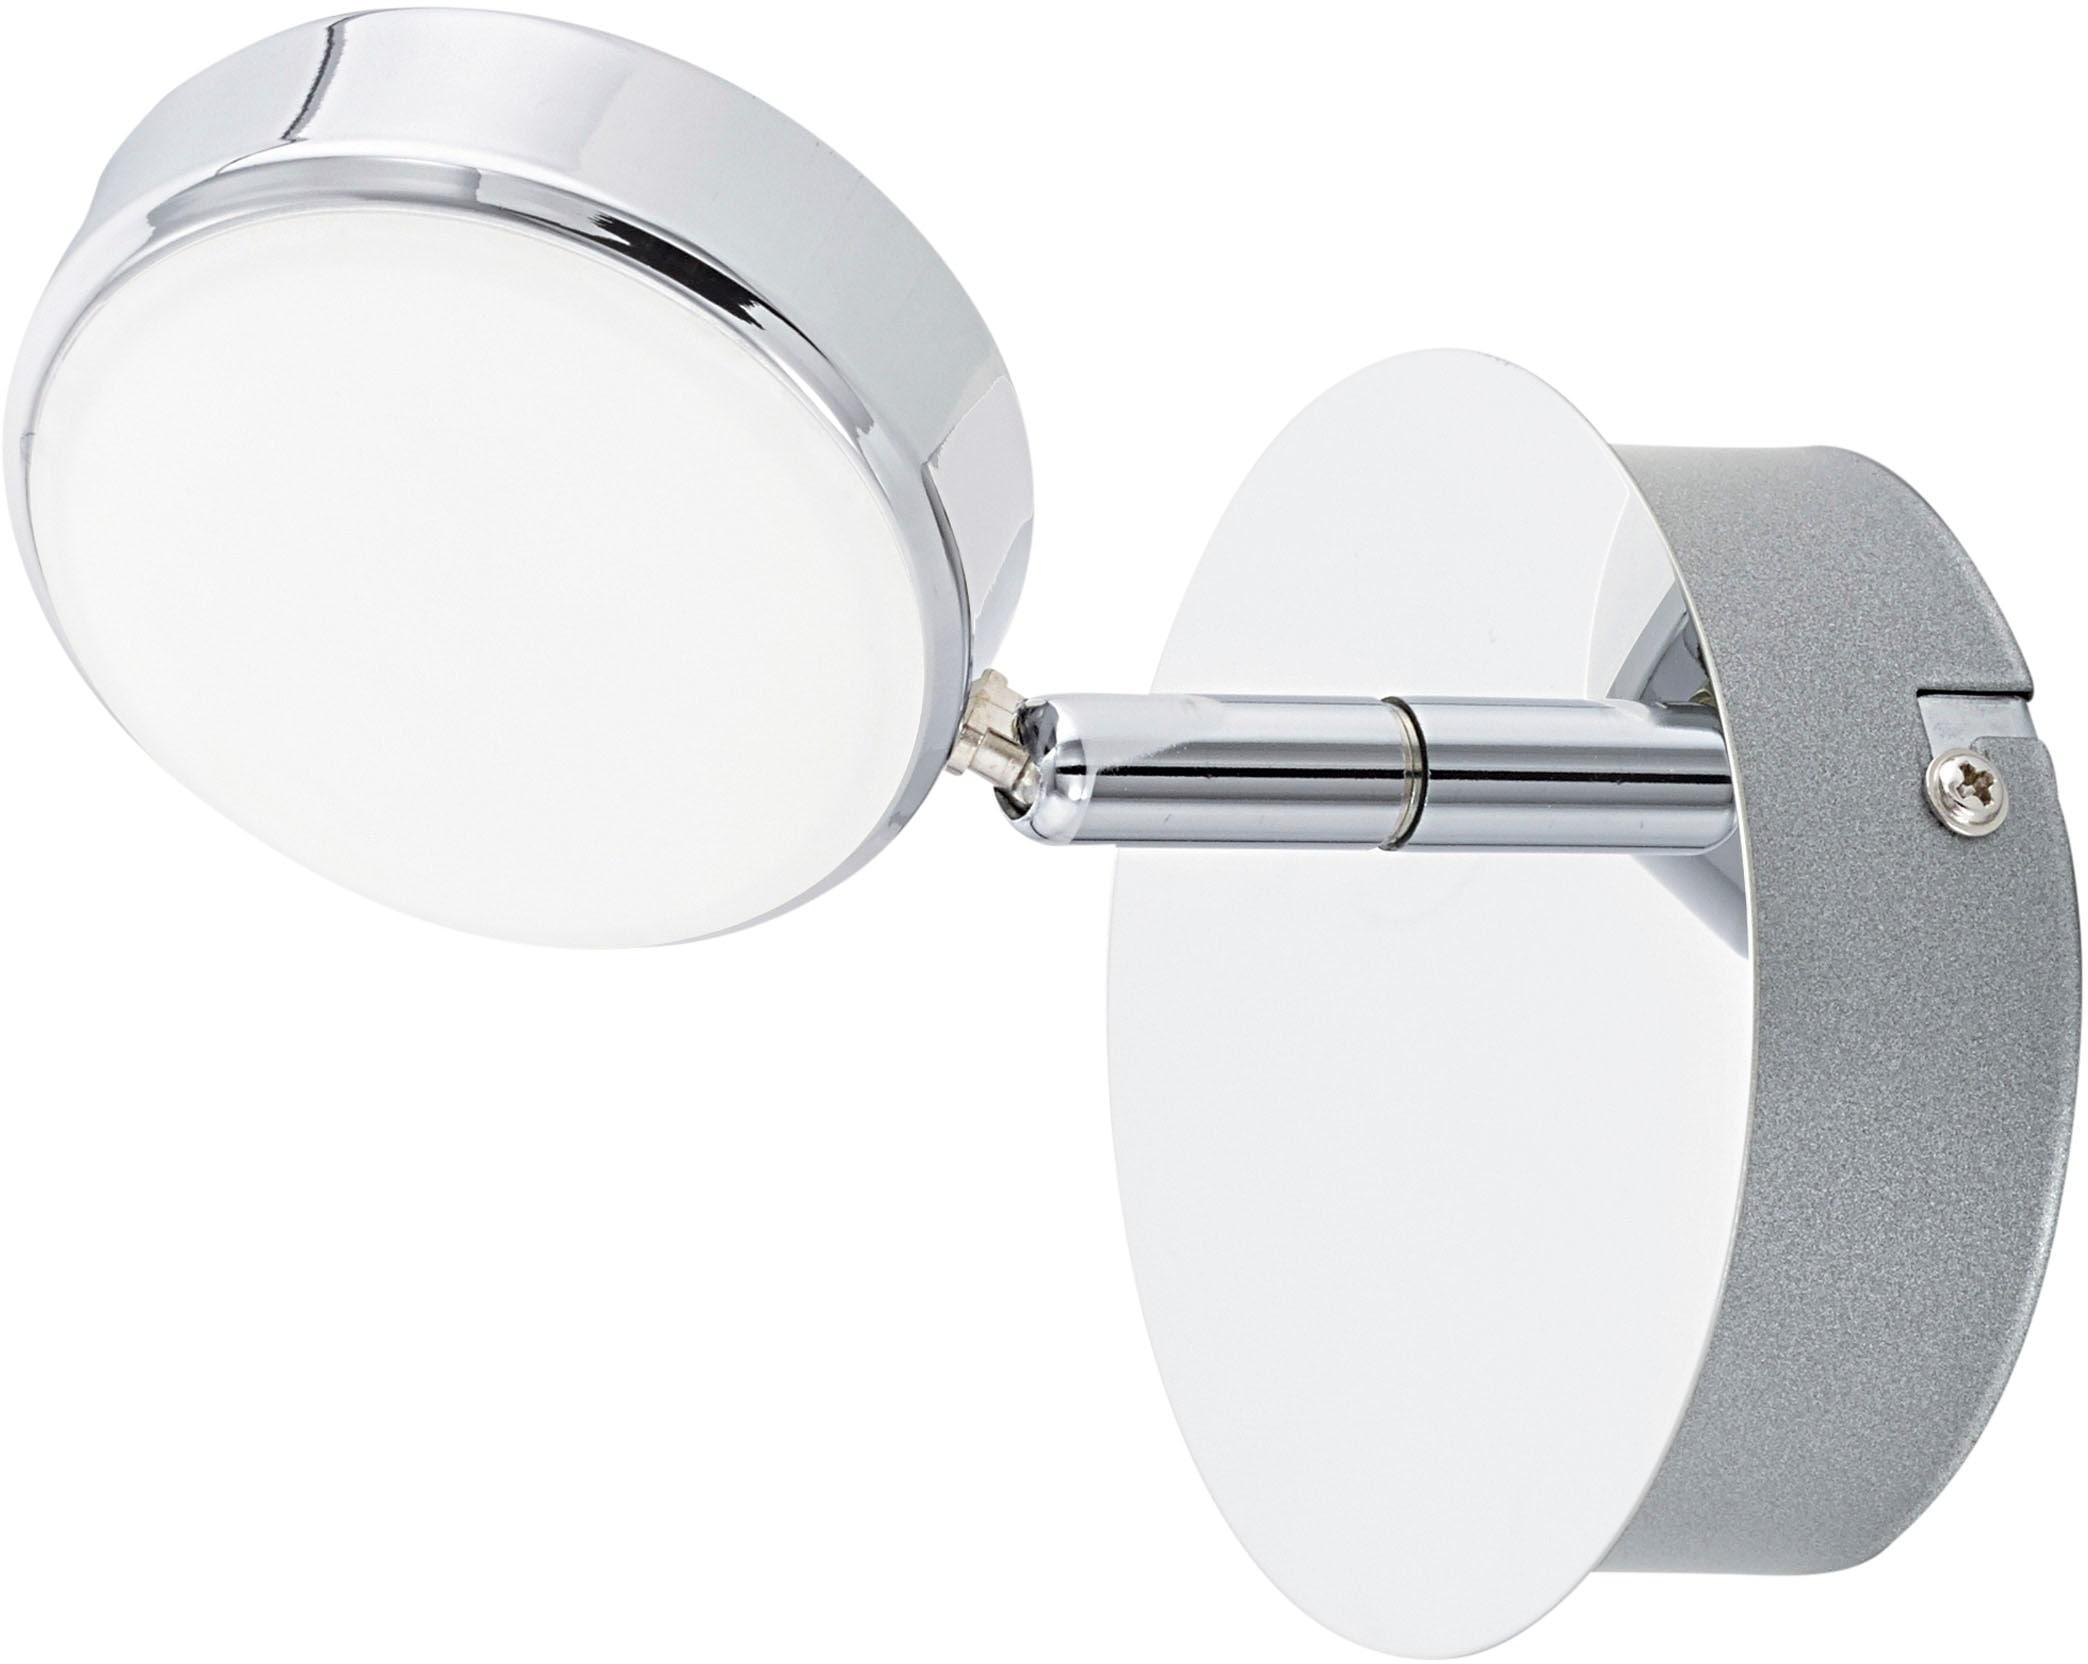 EGLO LED Wandleuchte SALTO, LED-Board, Warmweiß